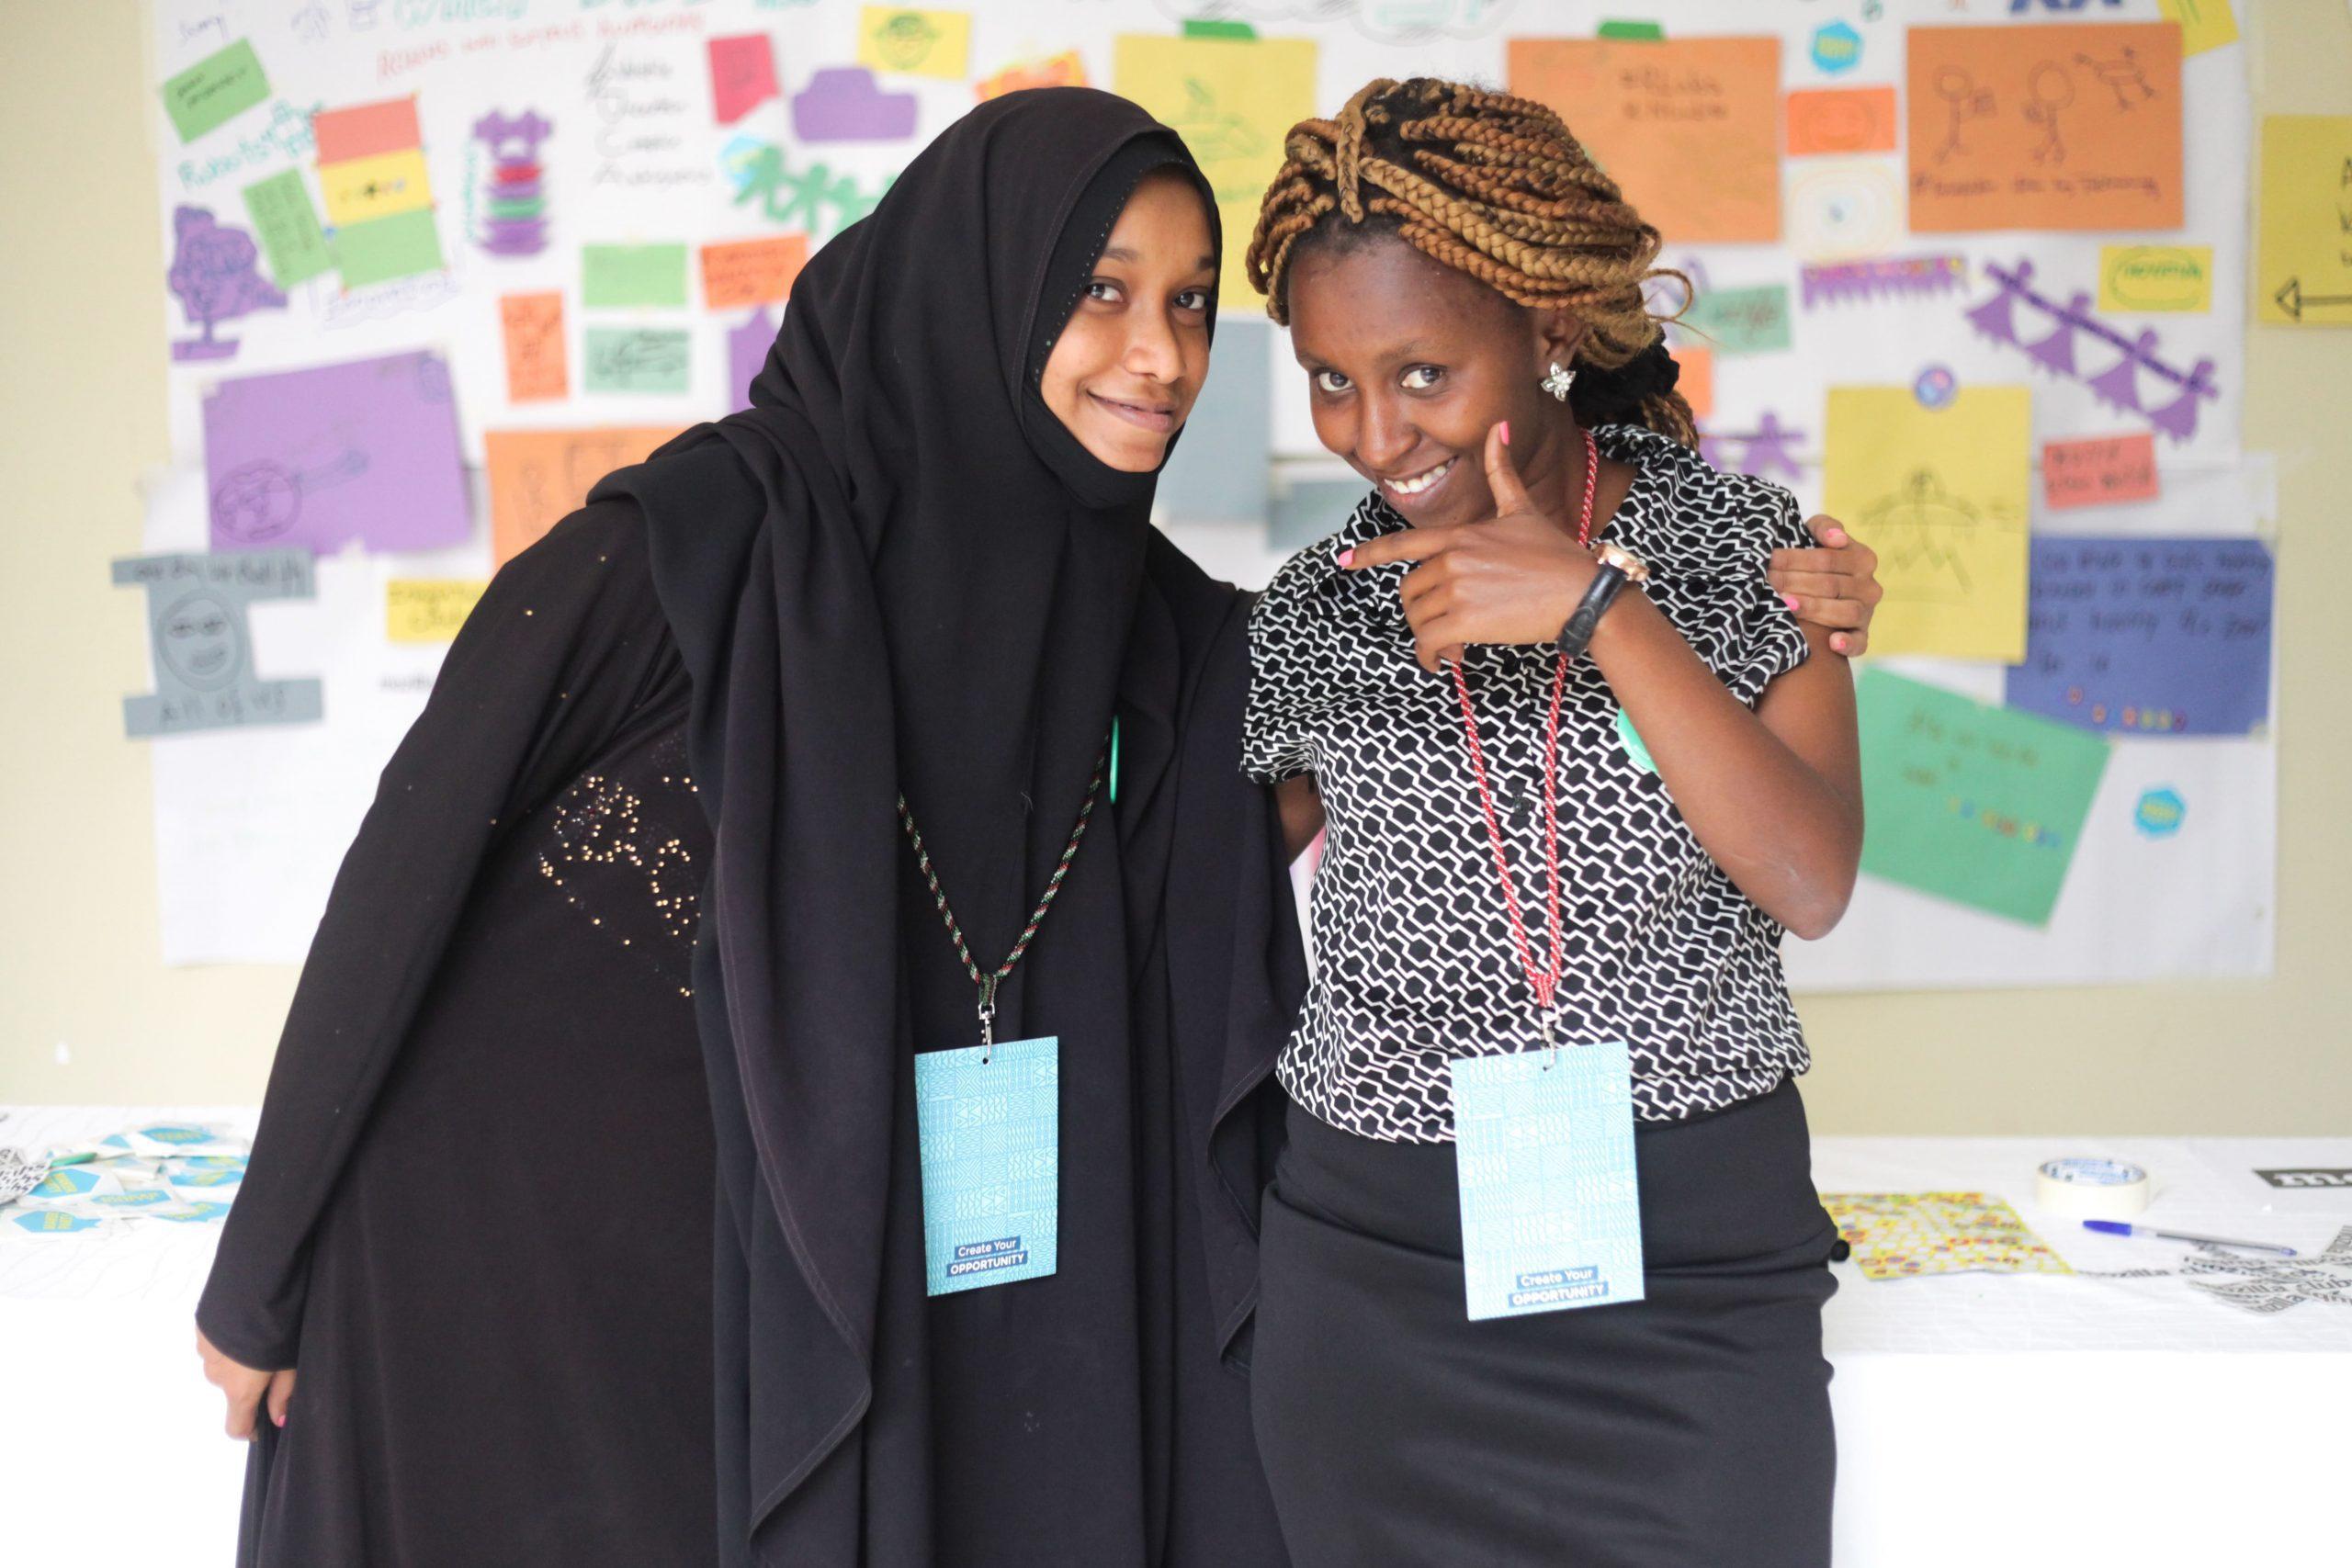 A photo of Aisha Abdulkadir and Ruth Kaveke from Kenya